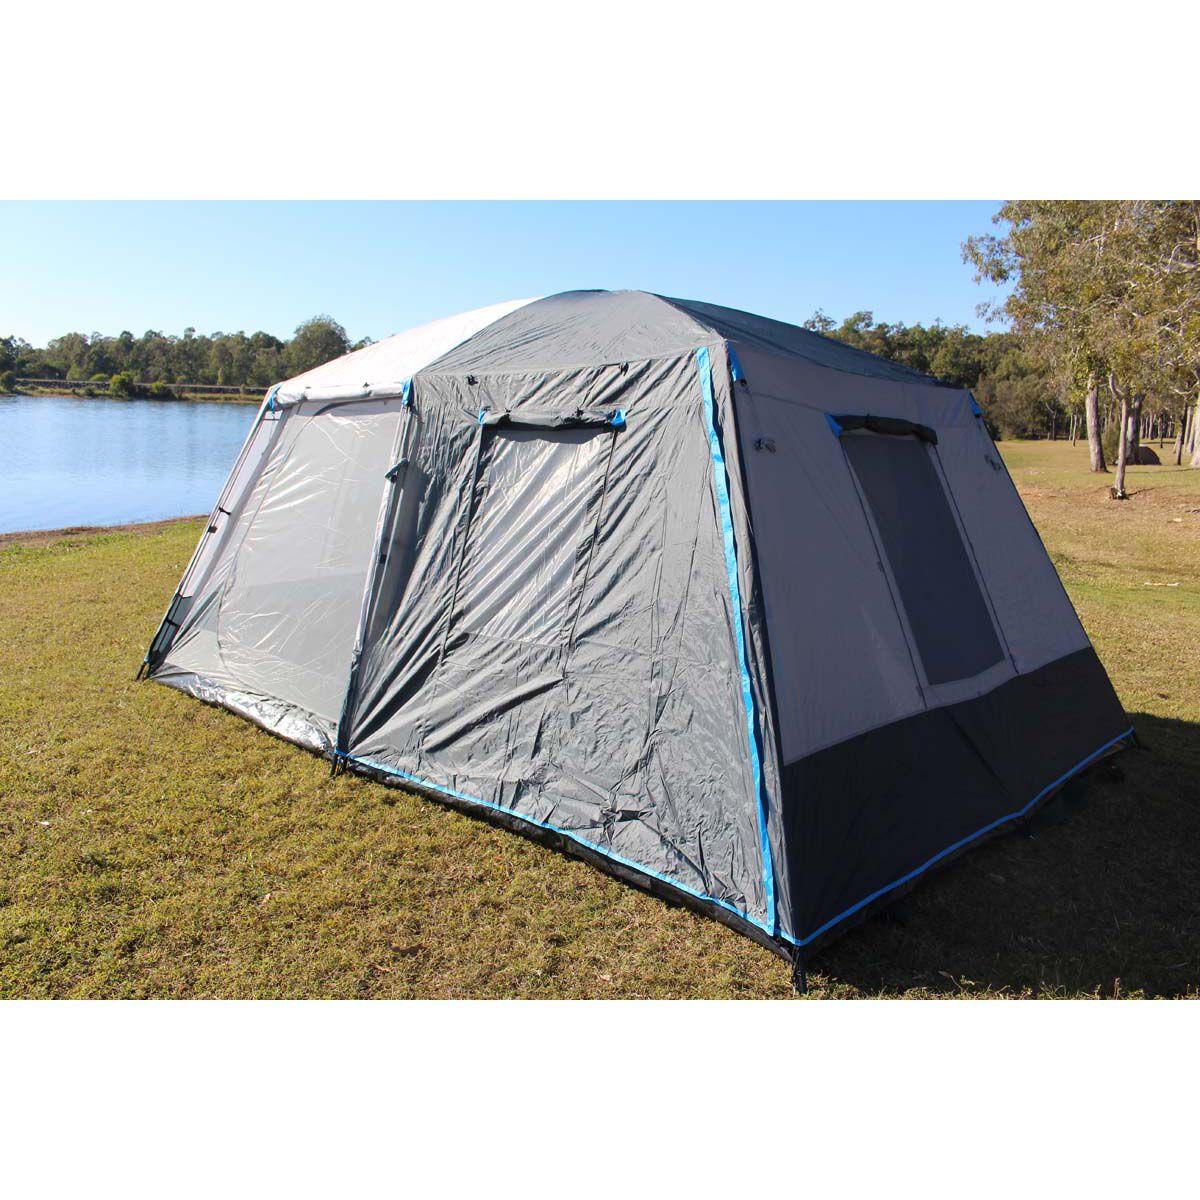 Wanderer goliath ii dome tent person bear tent chart jpg 1200x1200 Bear grylls tent chart  sc 1 st  topsimages.com & Bear Grylls Tent Chart | www.topsimages.com